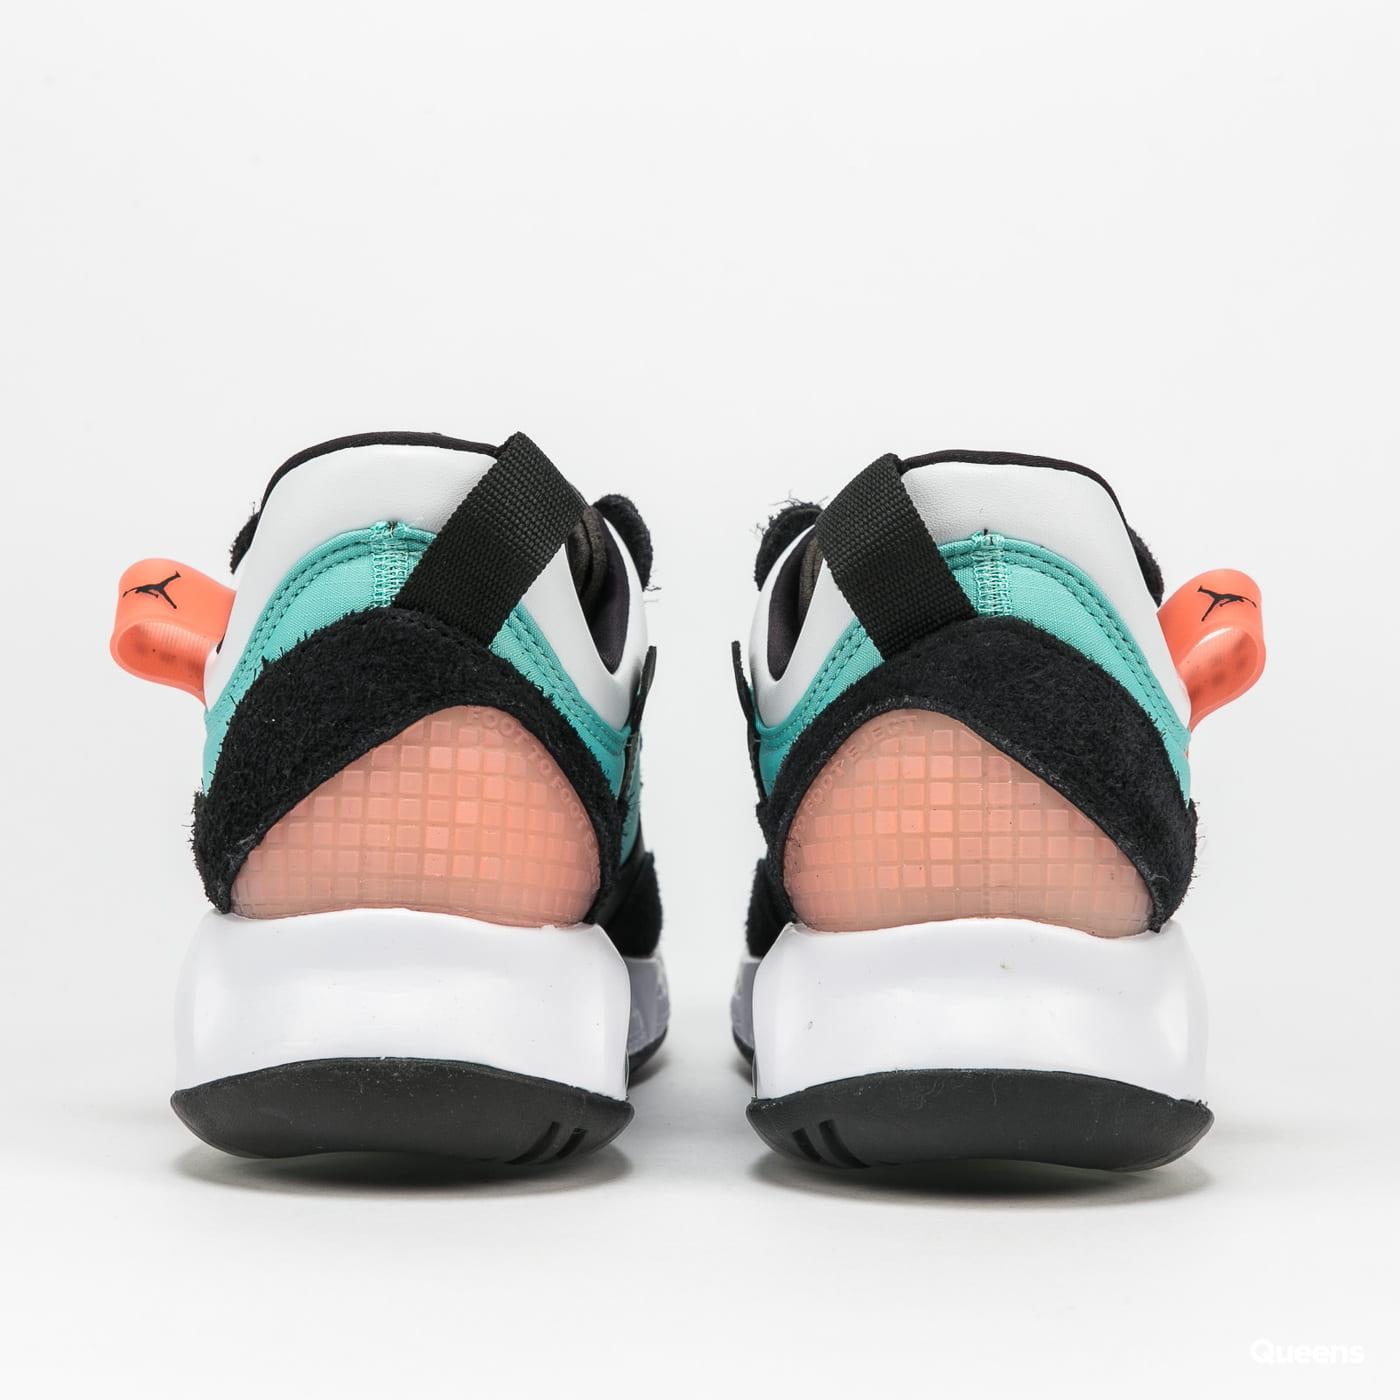 Jordan Jordan MA2 black / multi - color